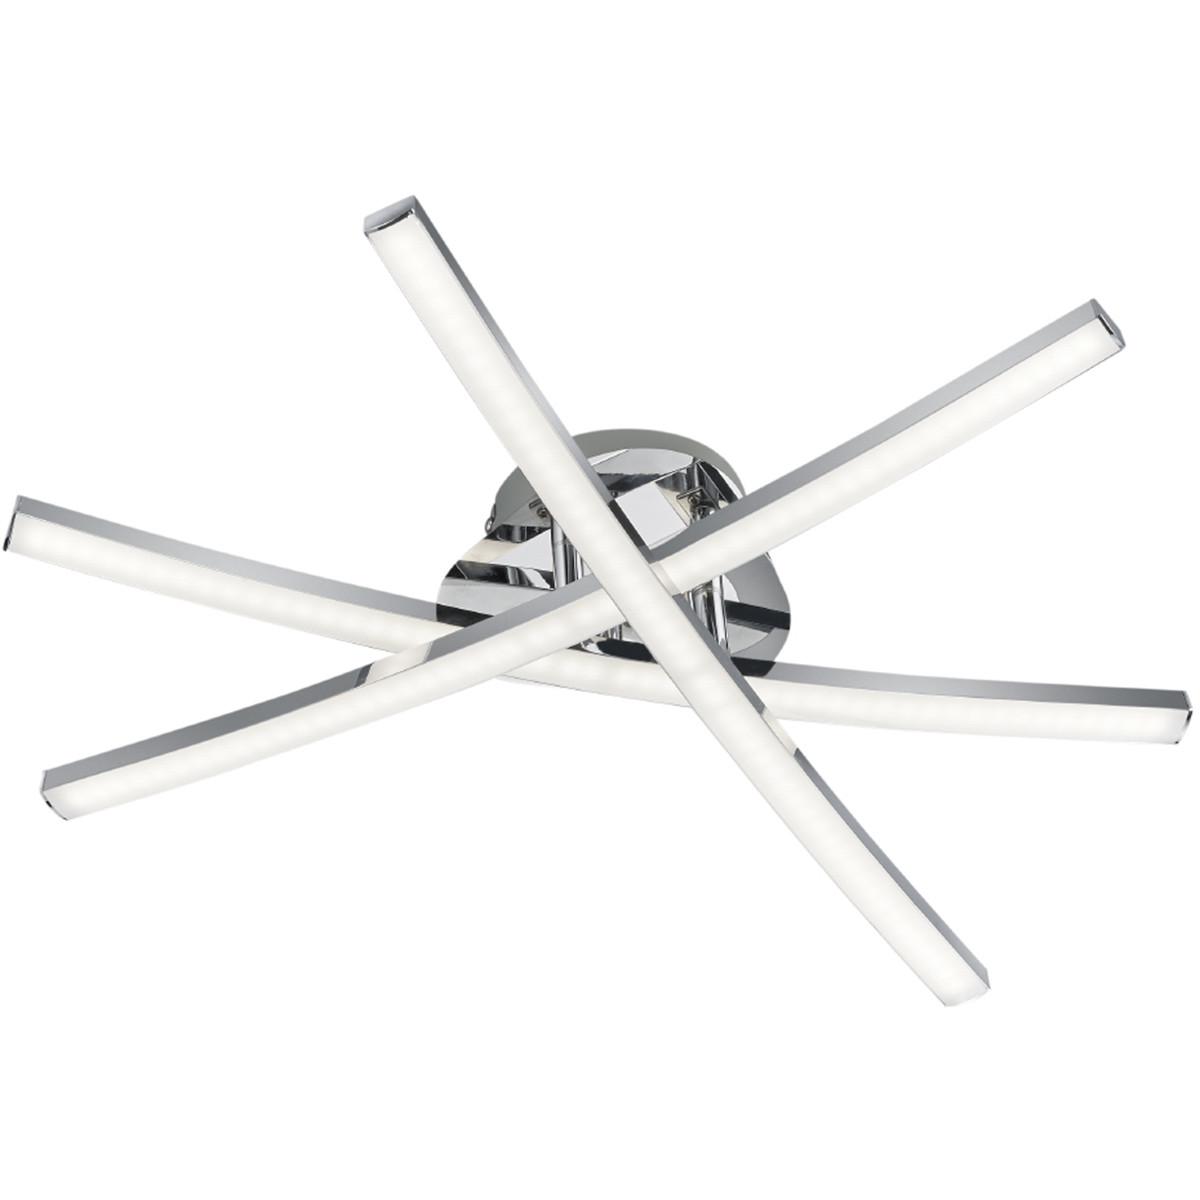 LED Plafondlamp - Plafondverlichting - Trion Cipolo - 15W - Warm Wit 3000K - Rechthoek - Glans Chroo